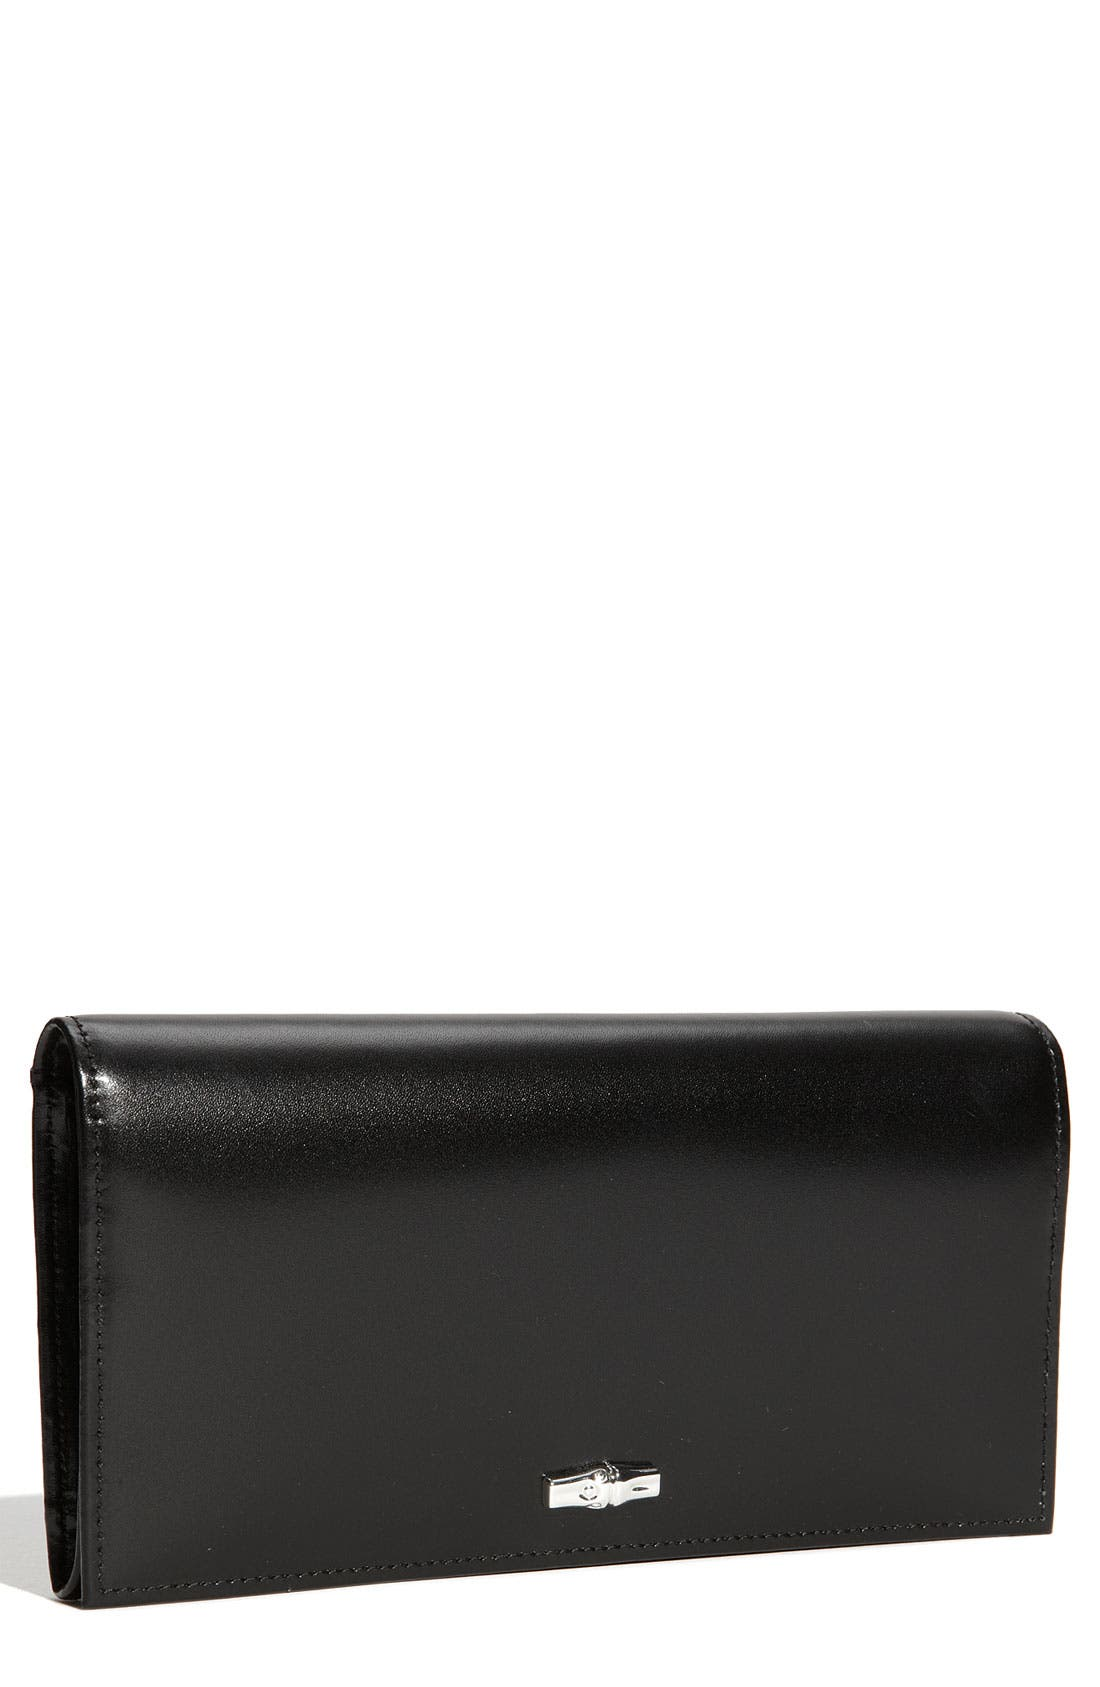 Alternate Image 1 Selected - Longchamp 'Roseau' Wallet